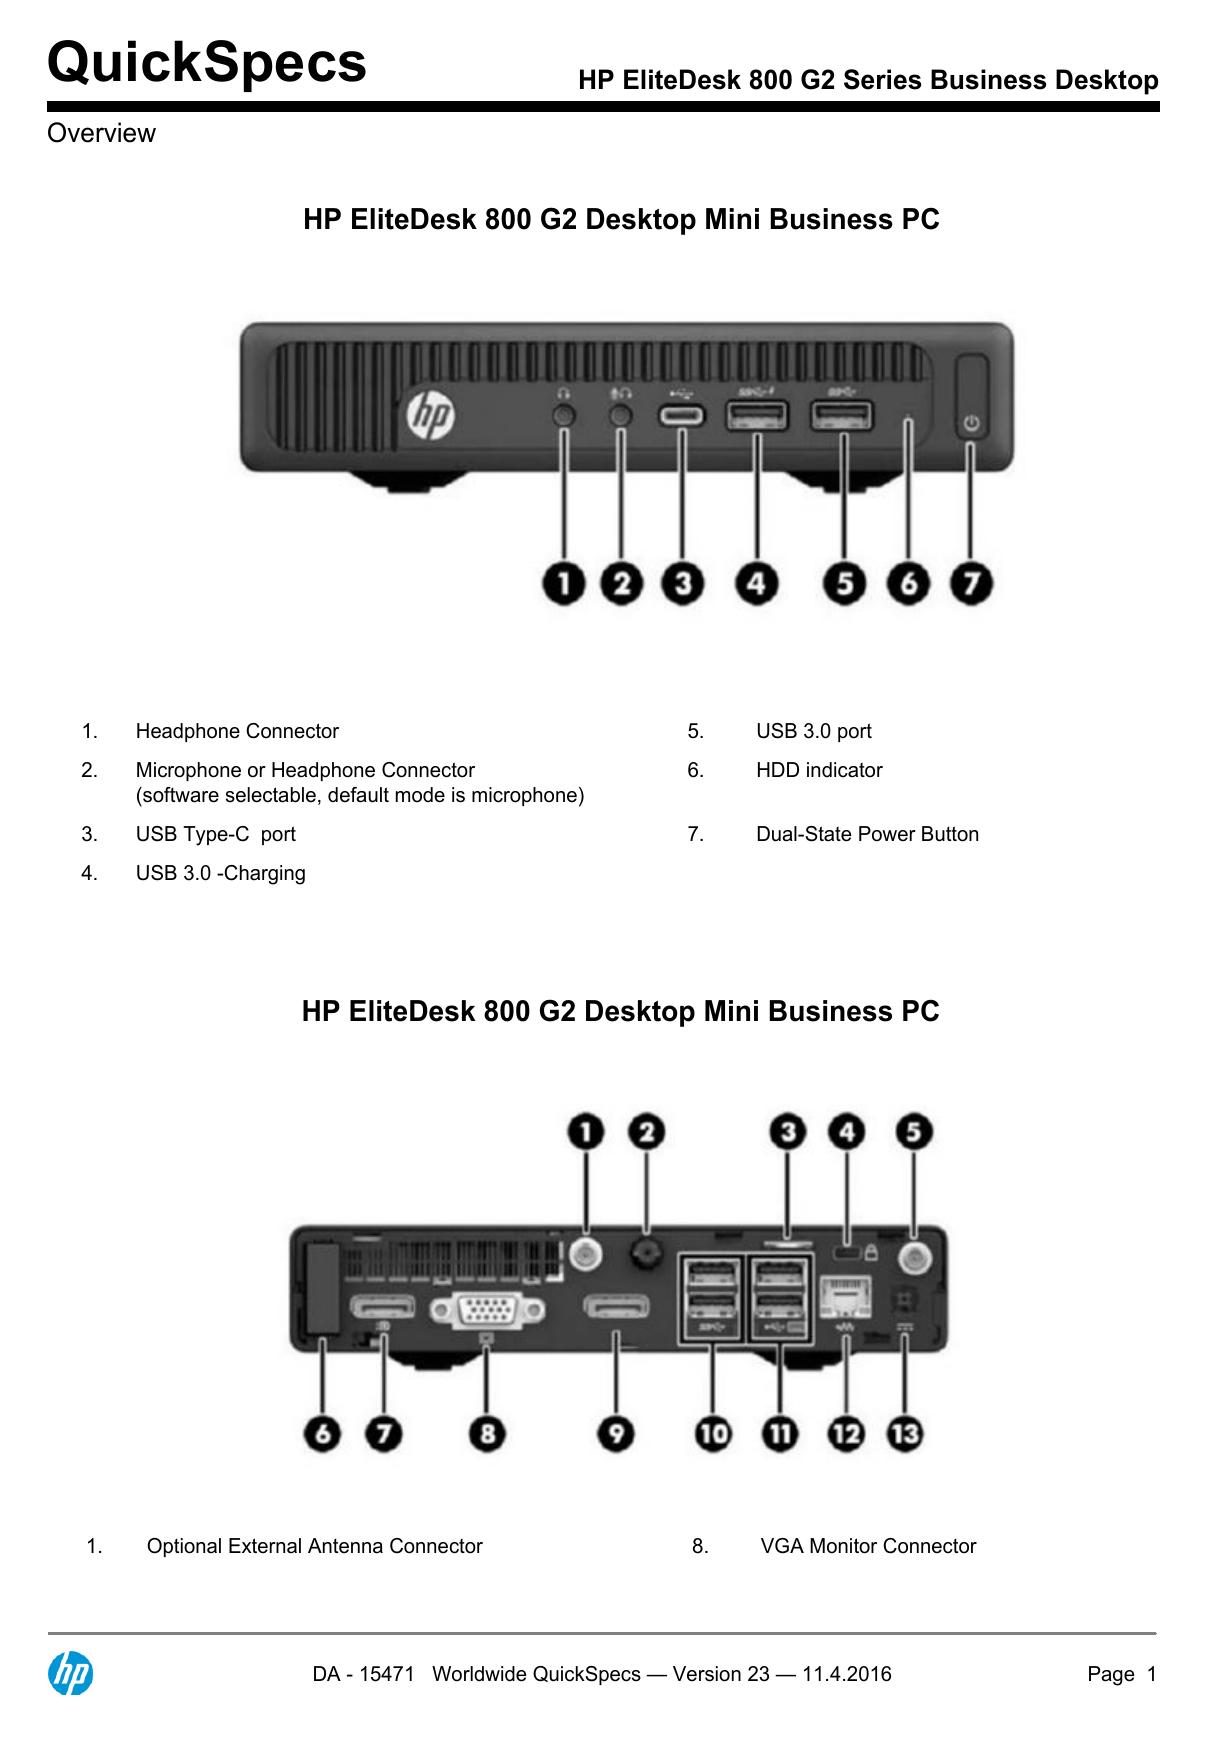 HP EliteDesk 800 G2 Series Business Desktop | manualzz com